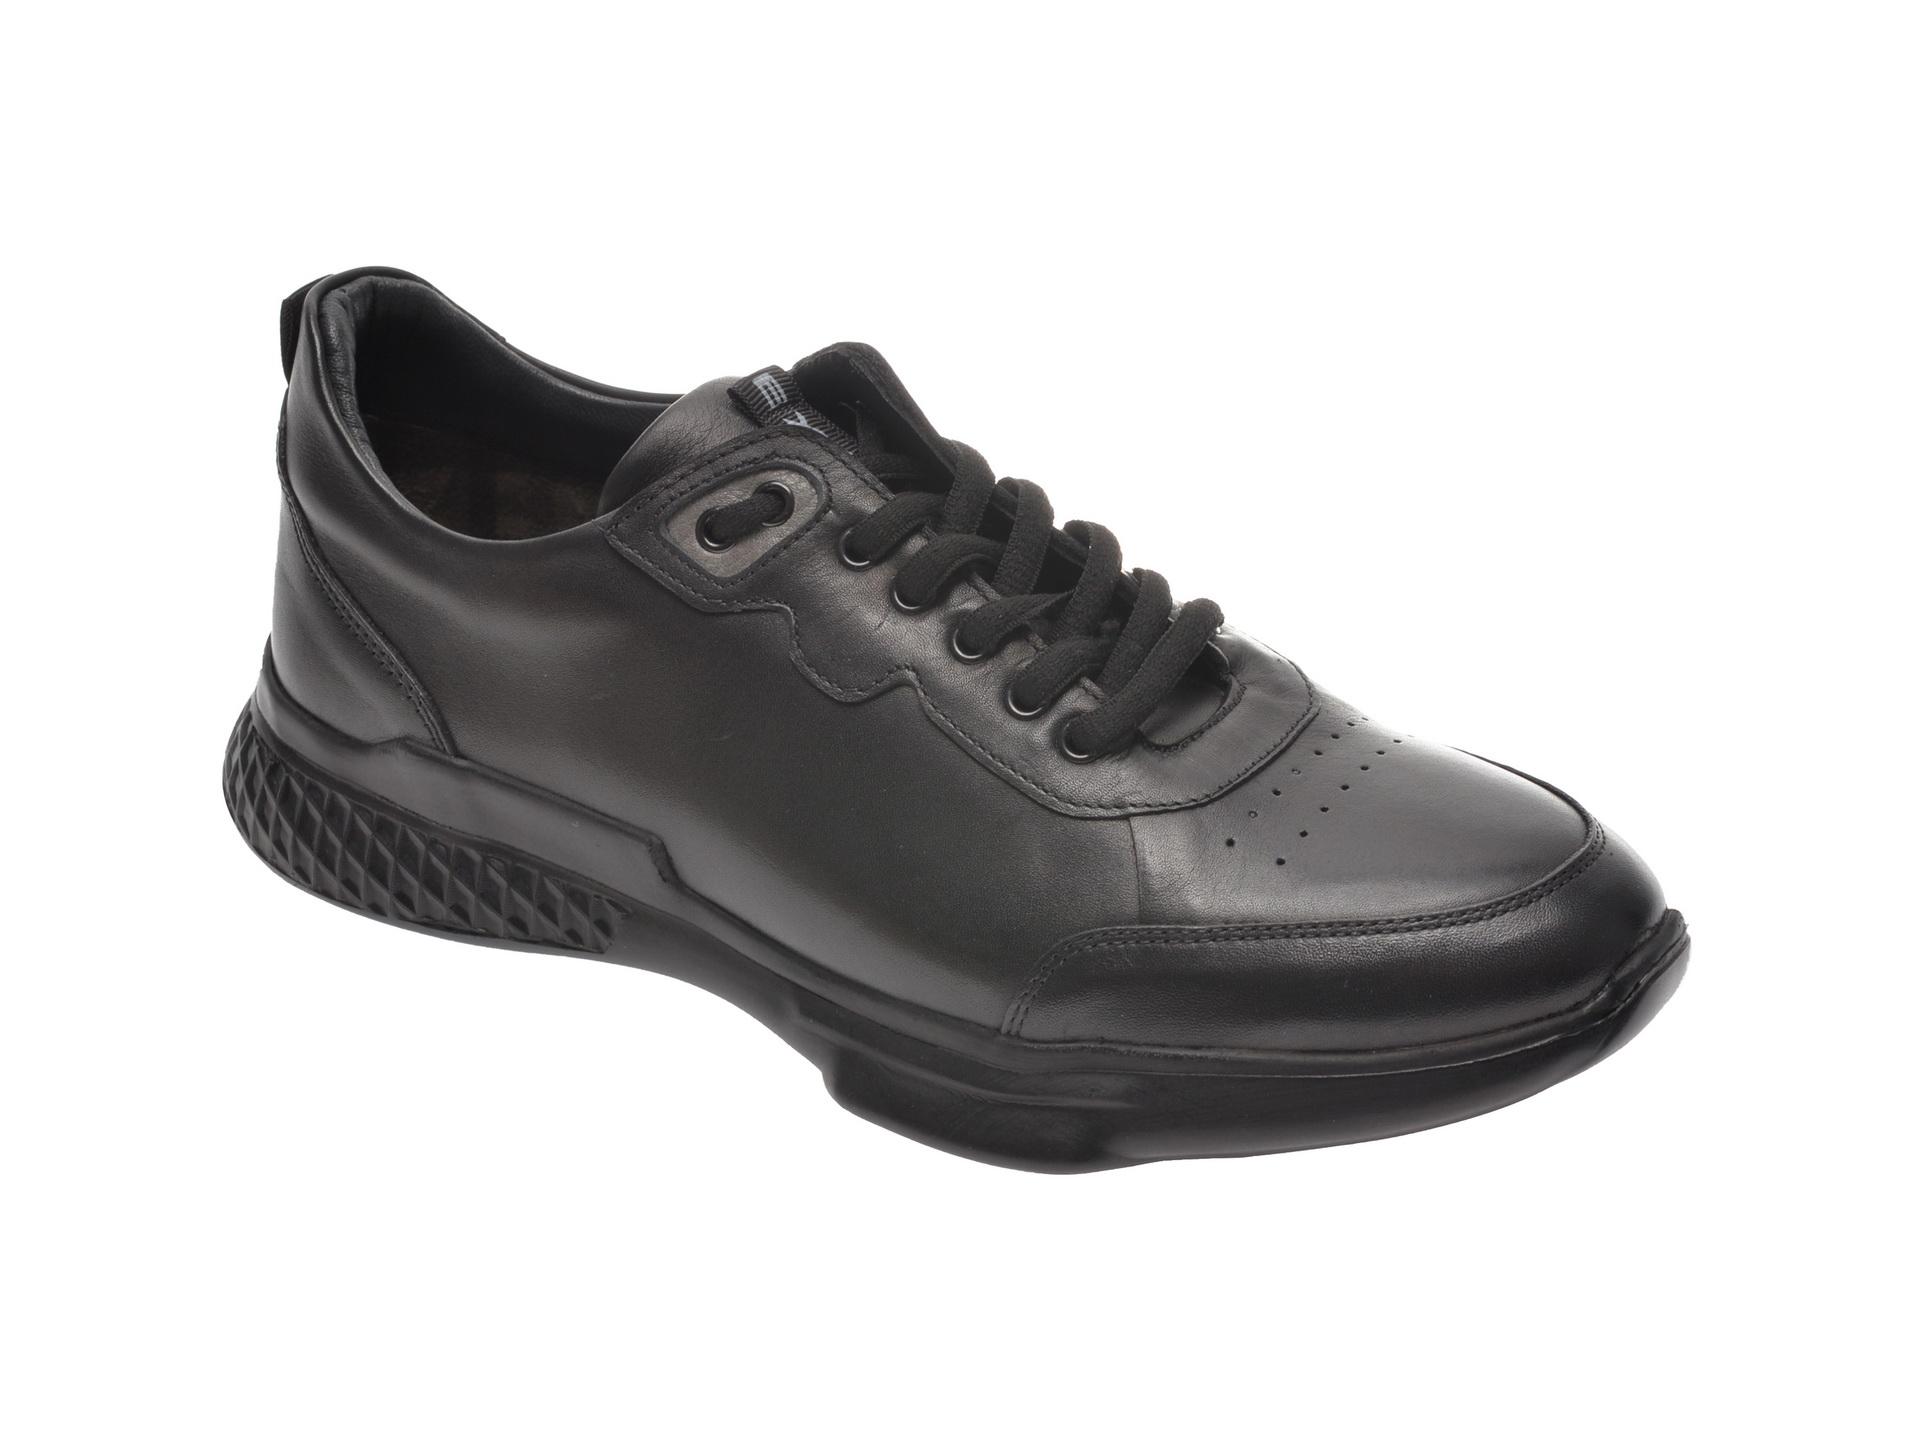 Pantofi Sport Otter Negri, 70401, Din Piele Naturala